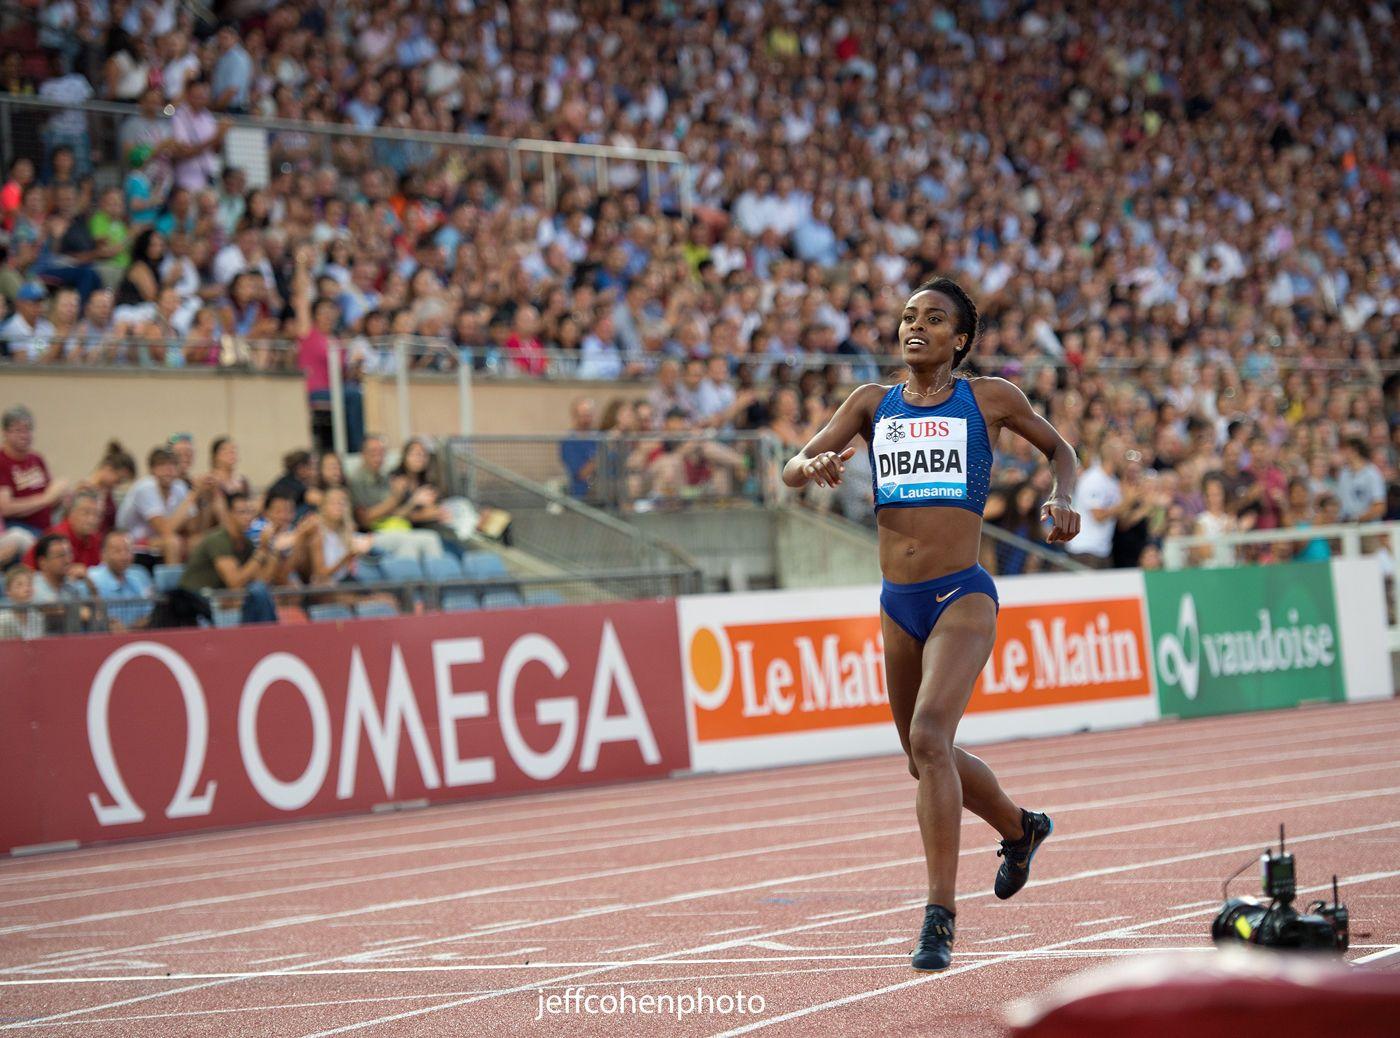 1r2016_athletissima_lausanne_dibaba_3000w_jeff_cohen_photo_1009_web.jpg